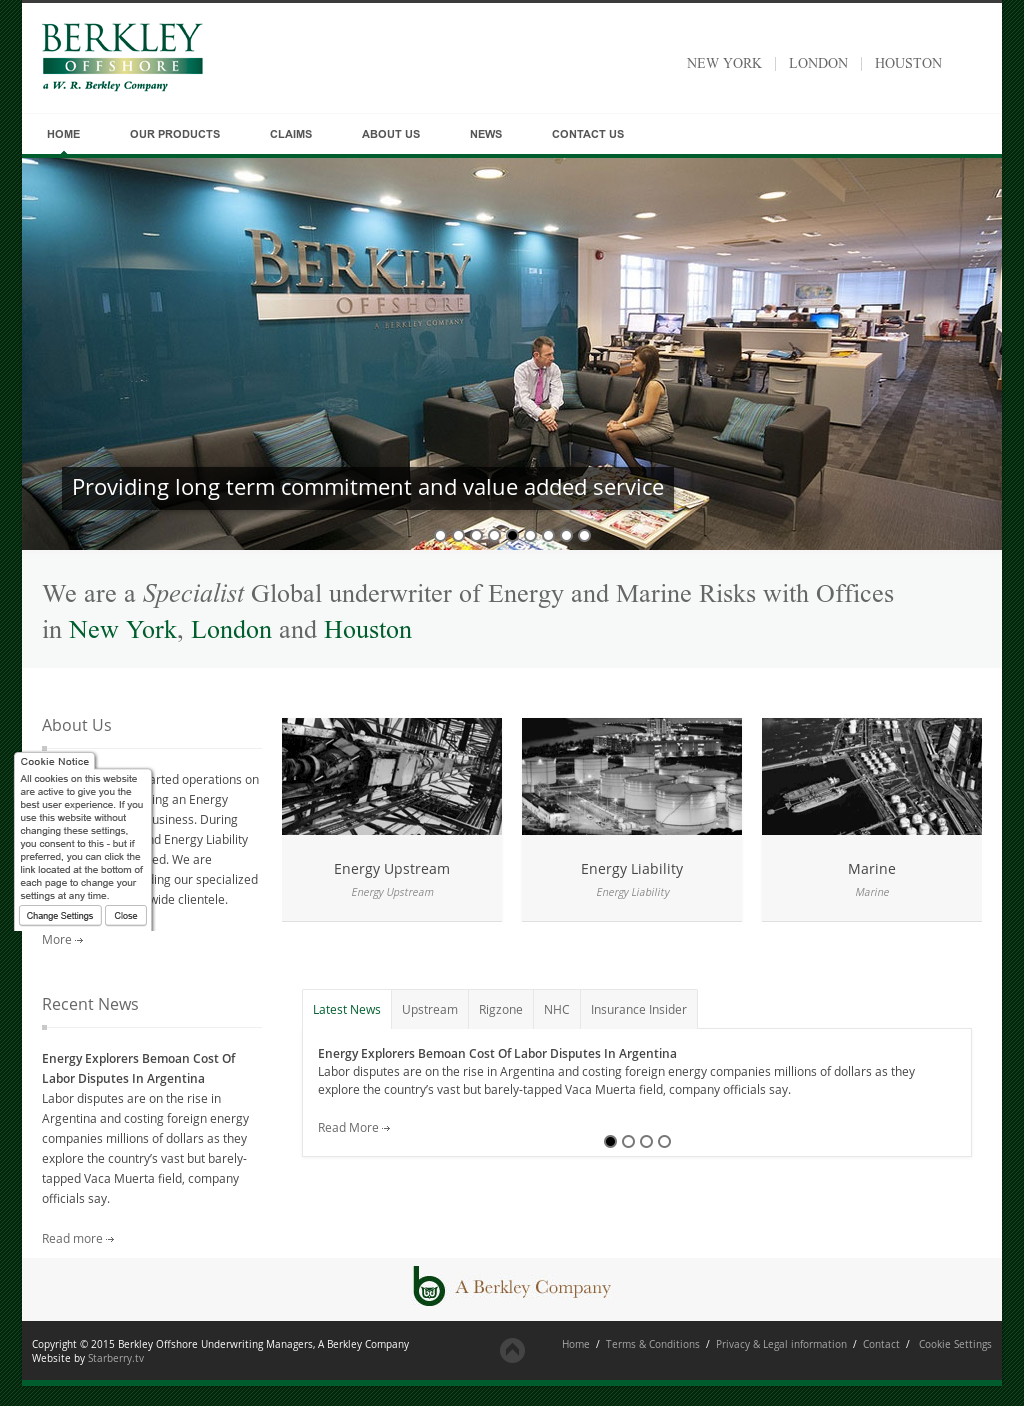 Berkley Offshore Competitors, Revenue and Employees - Owler